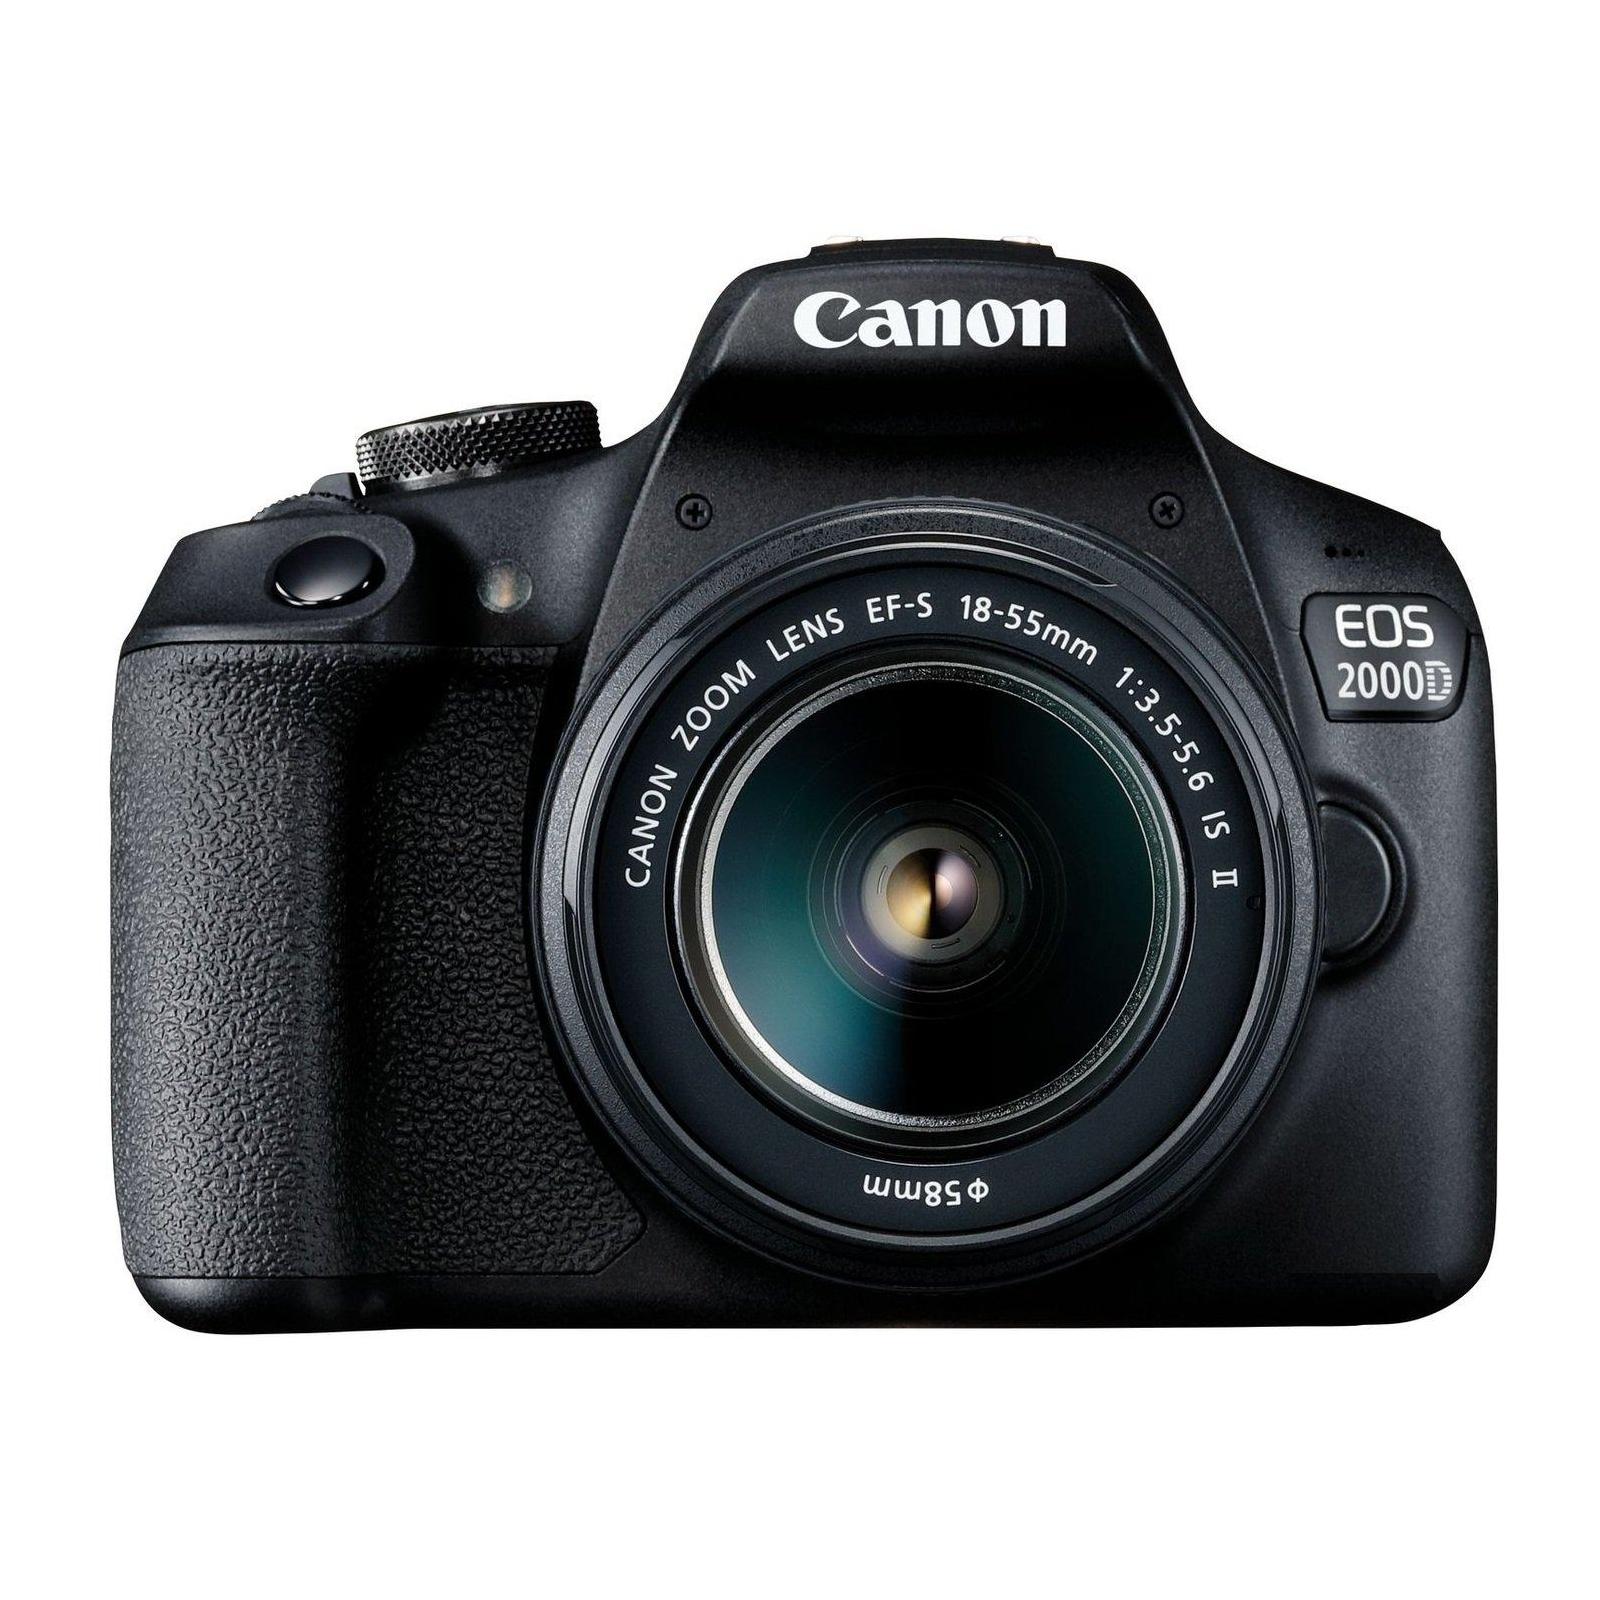 Цифровой фотоаппарат Canon EOS 2000D 18-55 IS II kit (2728C008)